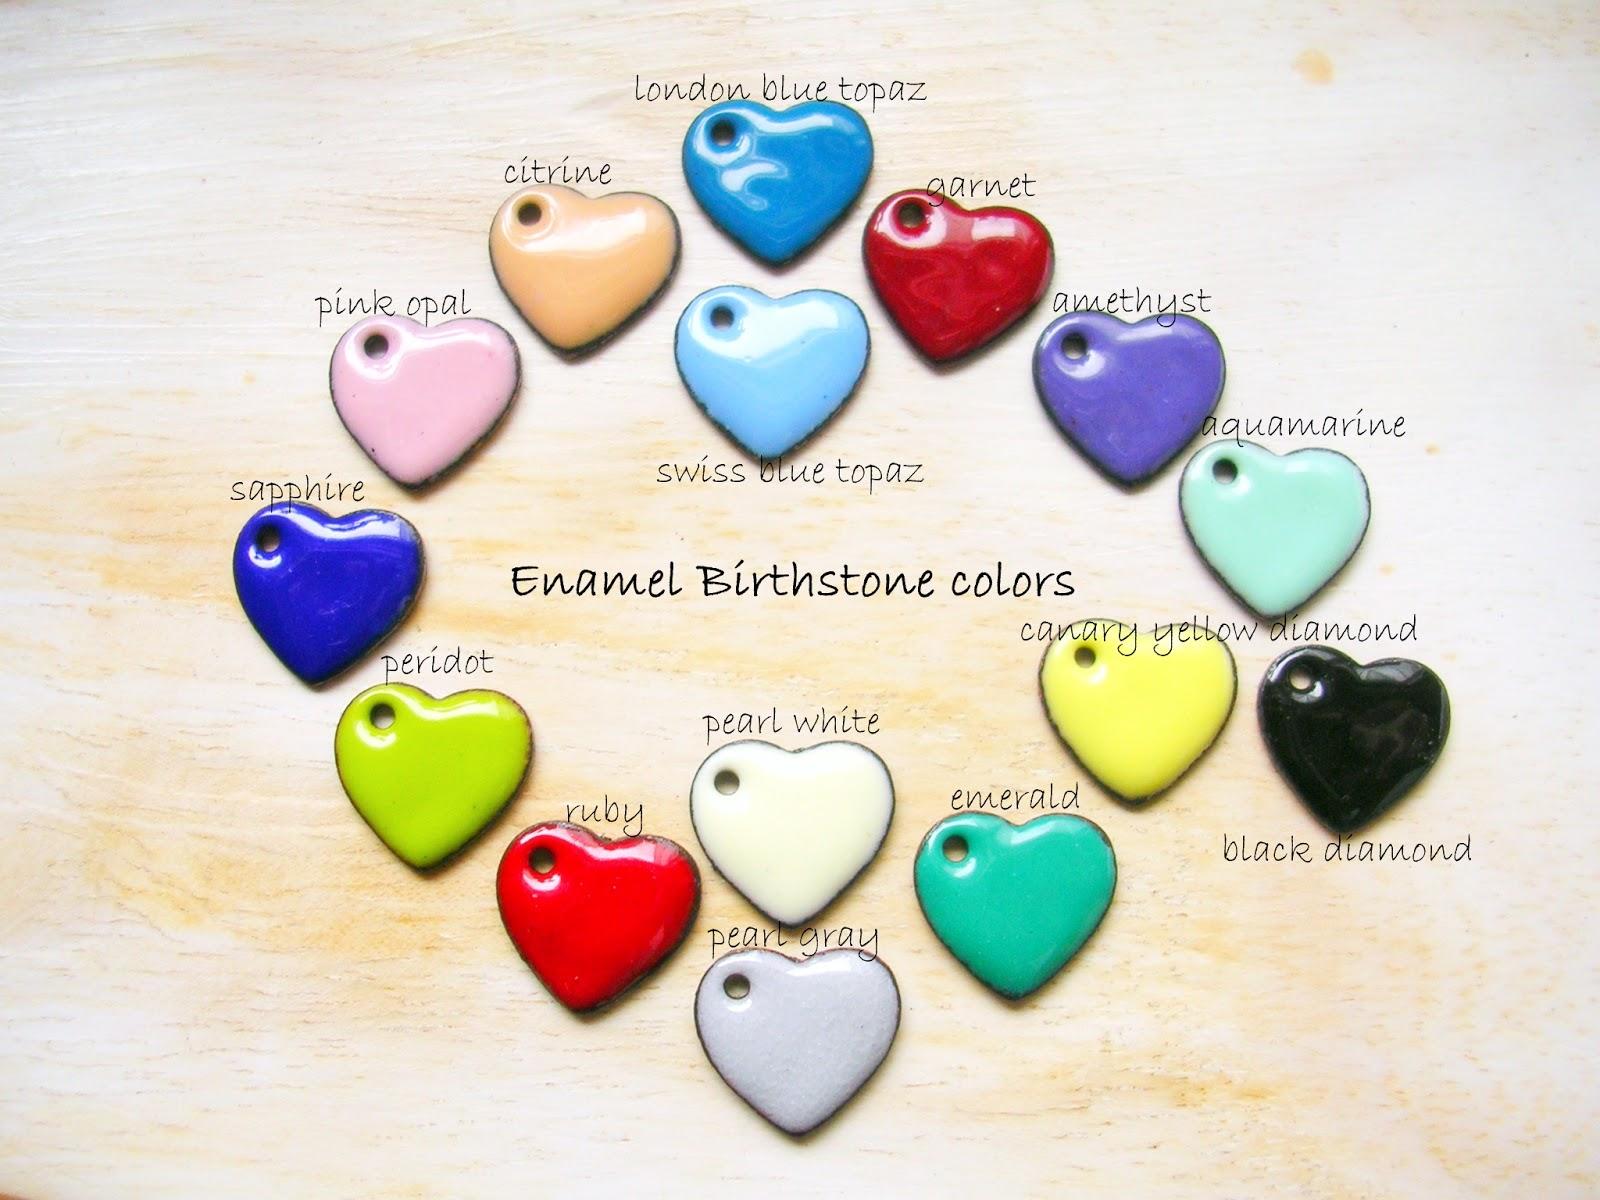 jewelry by natsuko enamel birthstone colors